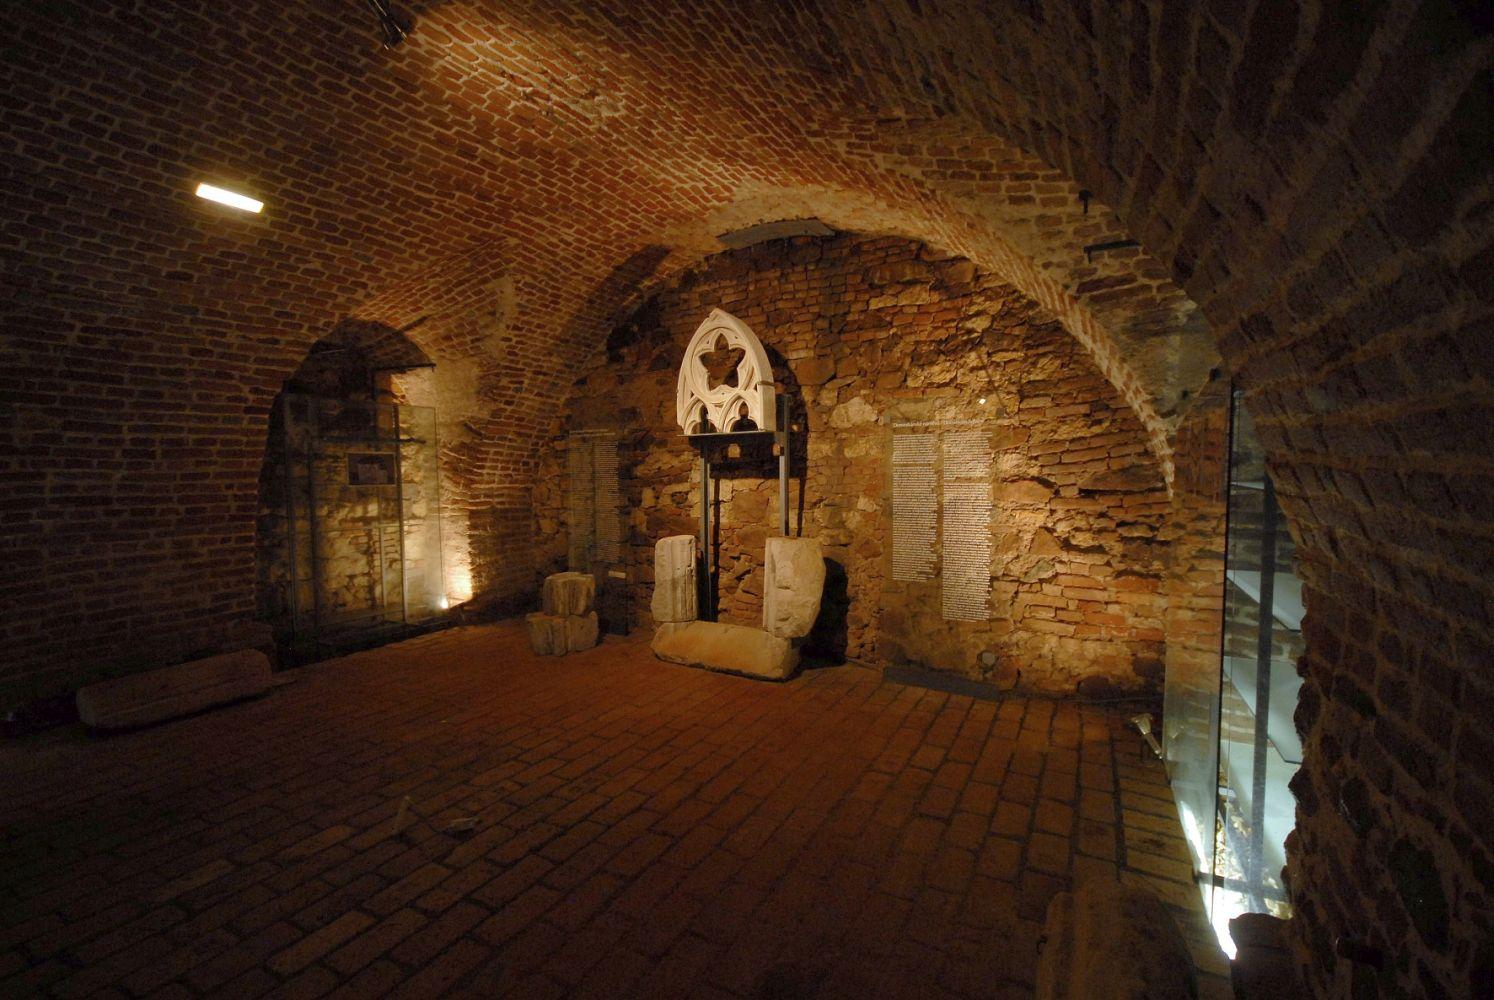 Brno Underground: Mintmaster's Cellar (Mincmistrovský sklep)